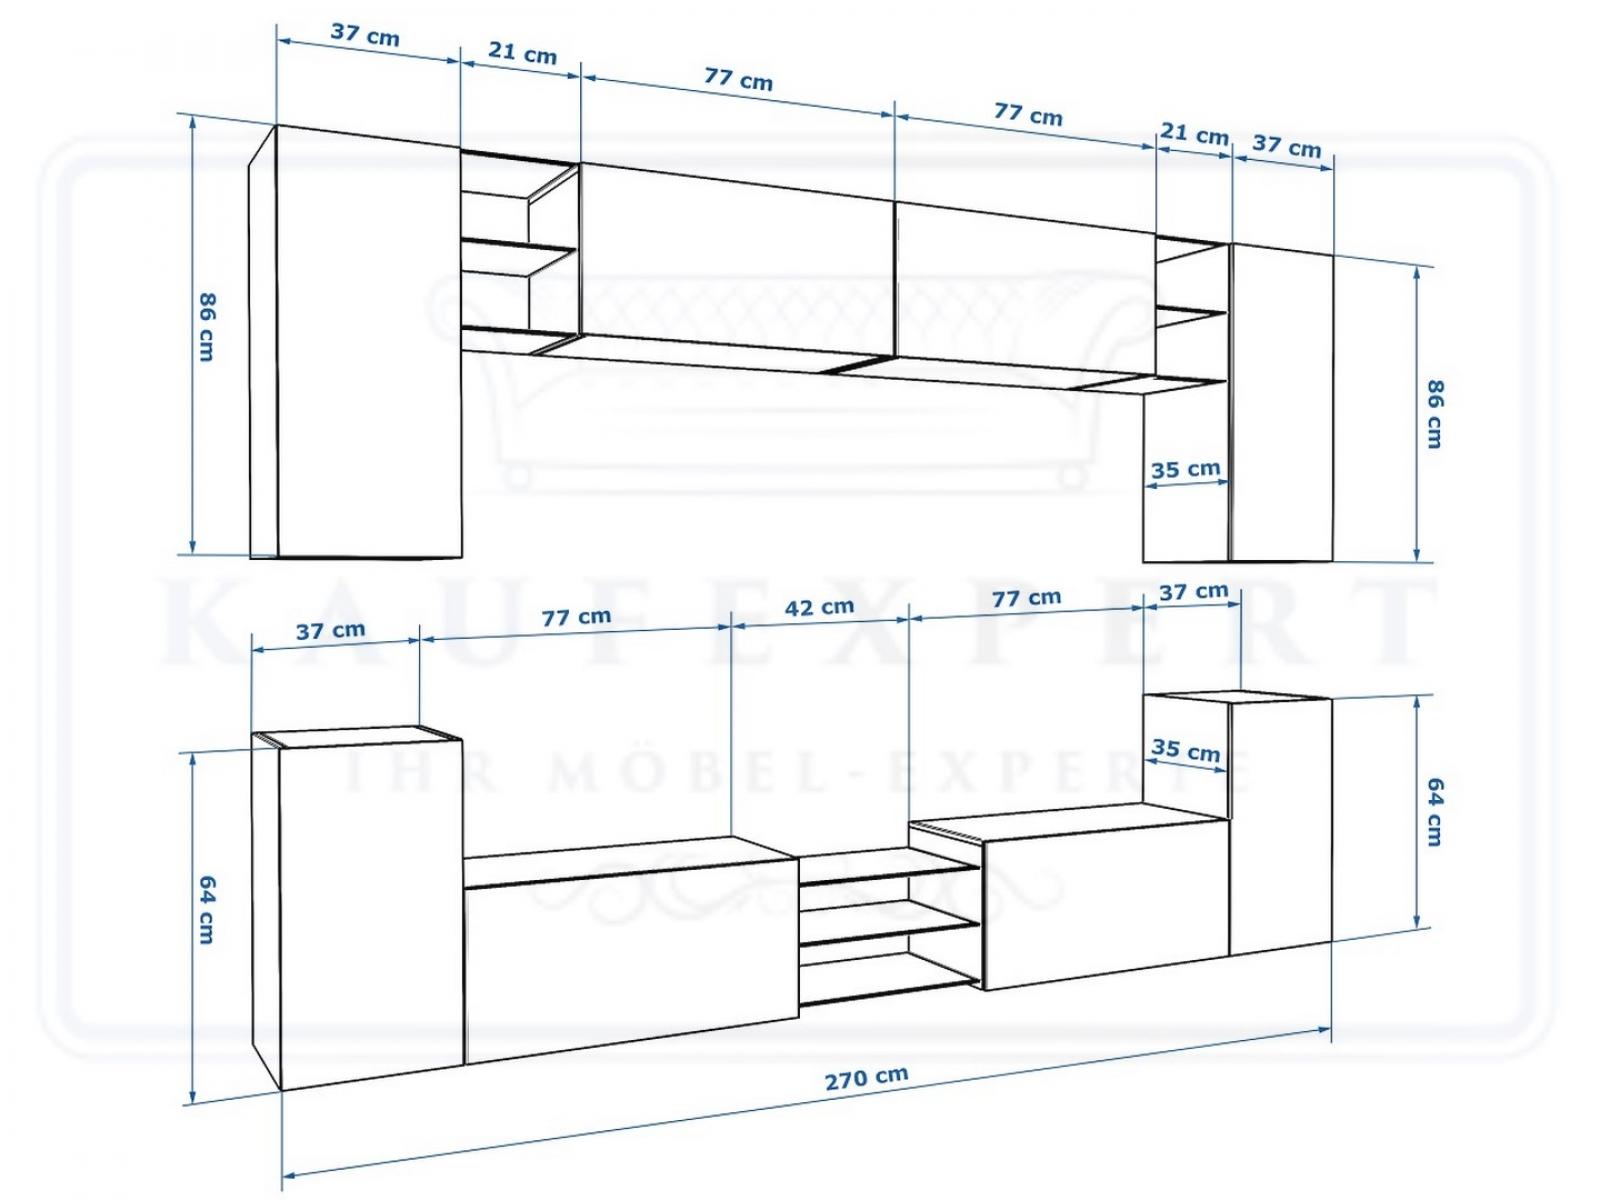 kaufexpert wohnwand galaxy wei hochglanz schwarz mediawand medienwand design modern led. Black Bedroom Furniture Sets. Home Design Ideas